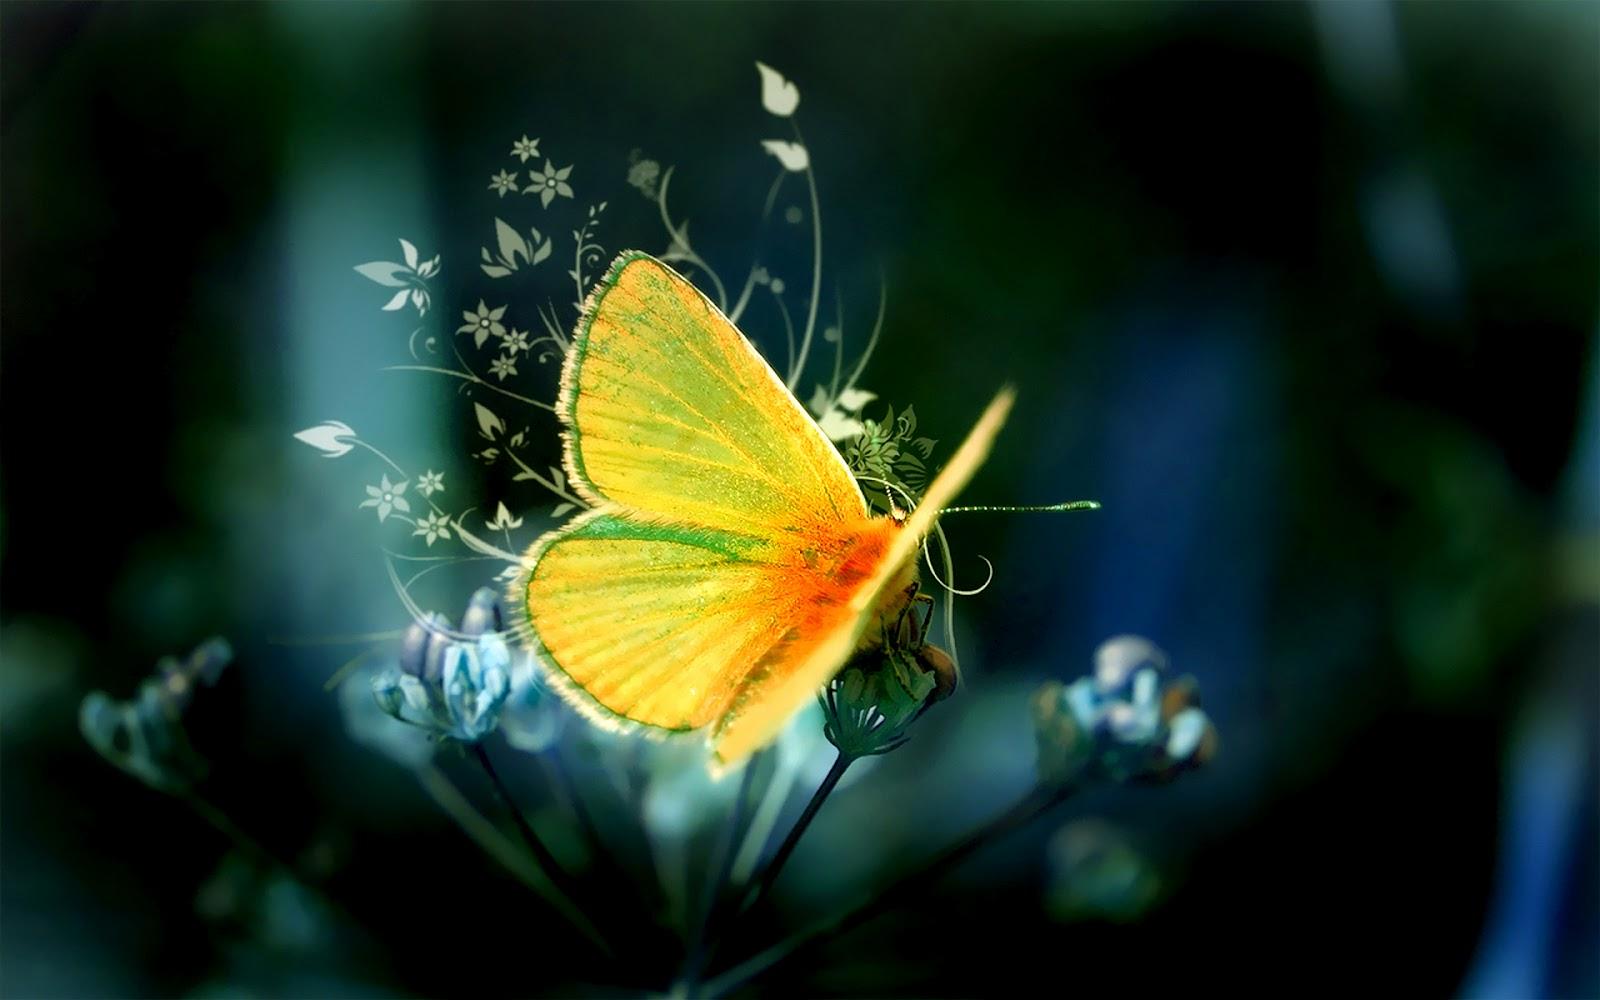 http://4.bp.blogspot.com/-typja3pjg8U/UER5nCkByHI/AAAAAAAAF2E/nIdtHy6dB1U/s1600/hd-vlinder-achtergrond-met-een-mooie-gele-vlinder-op-een-bloem-hd-vlinder-wallpaper-foto.jpg